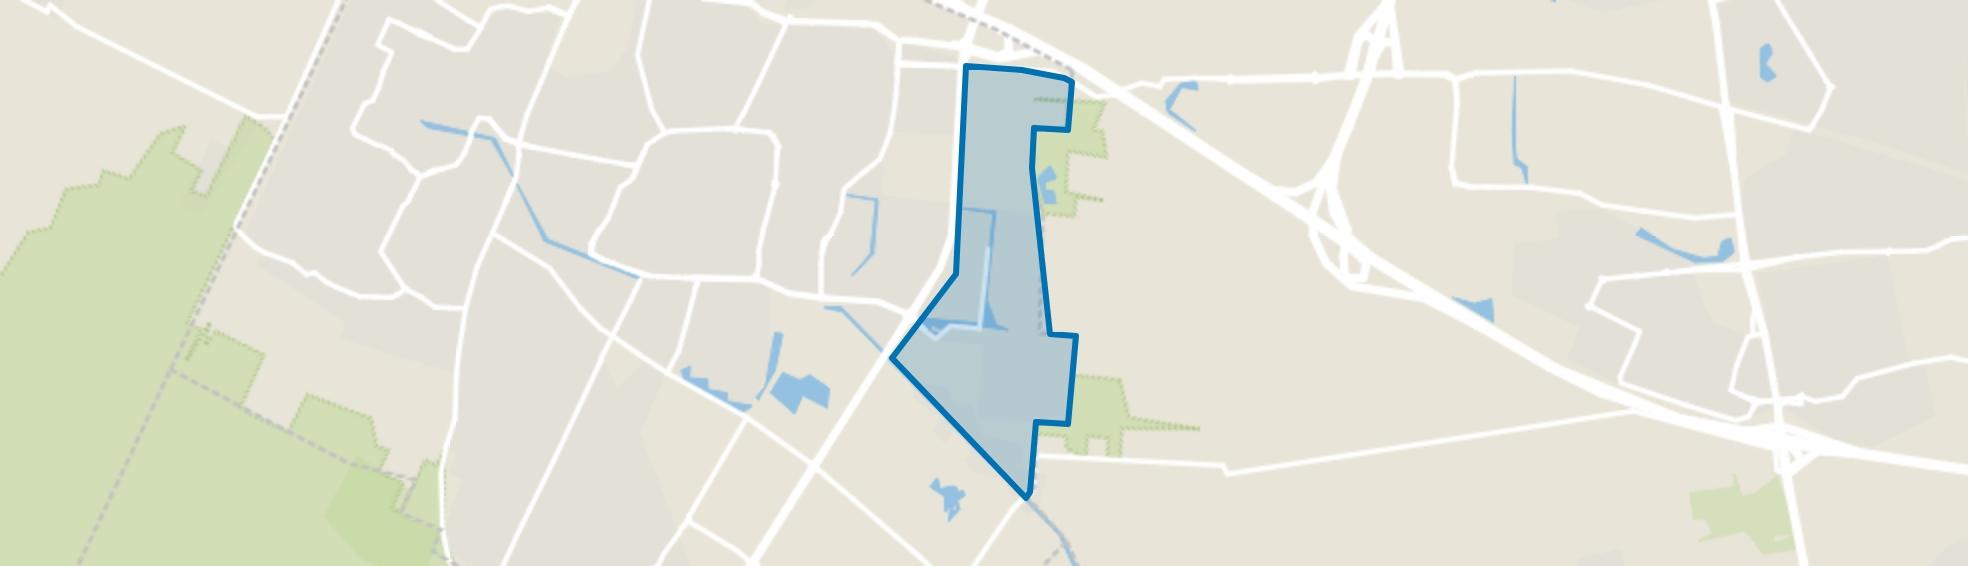 Veenendaal-Oost, Veenendaal map